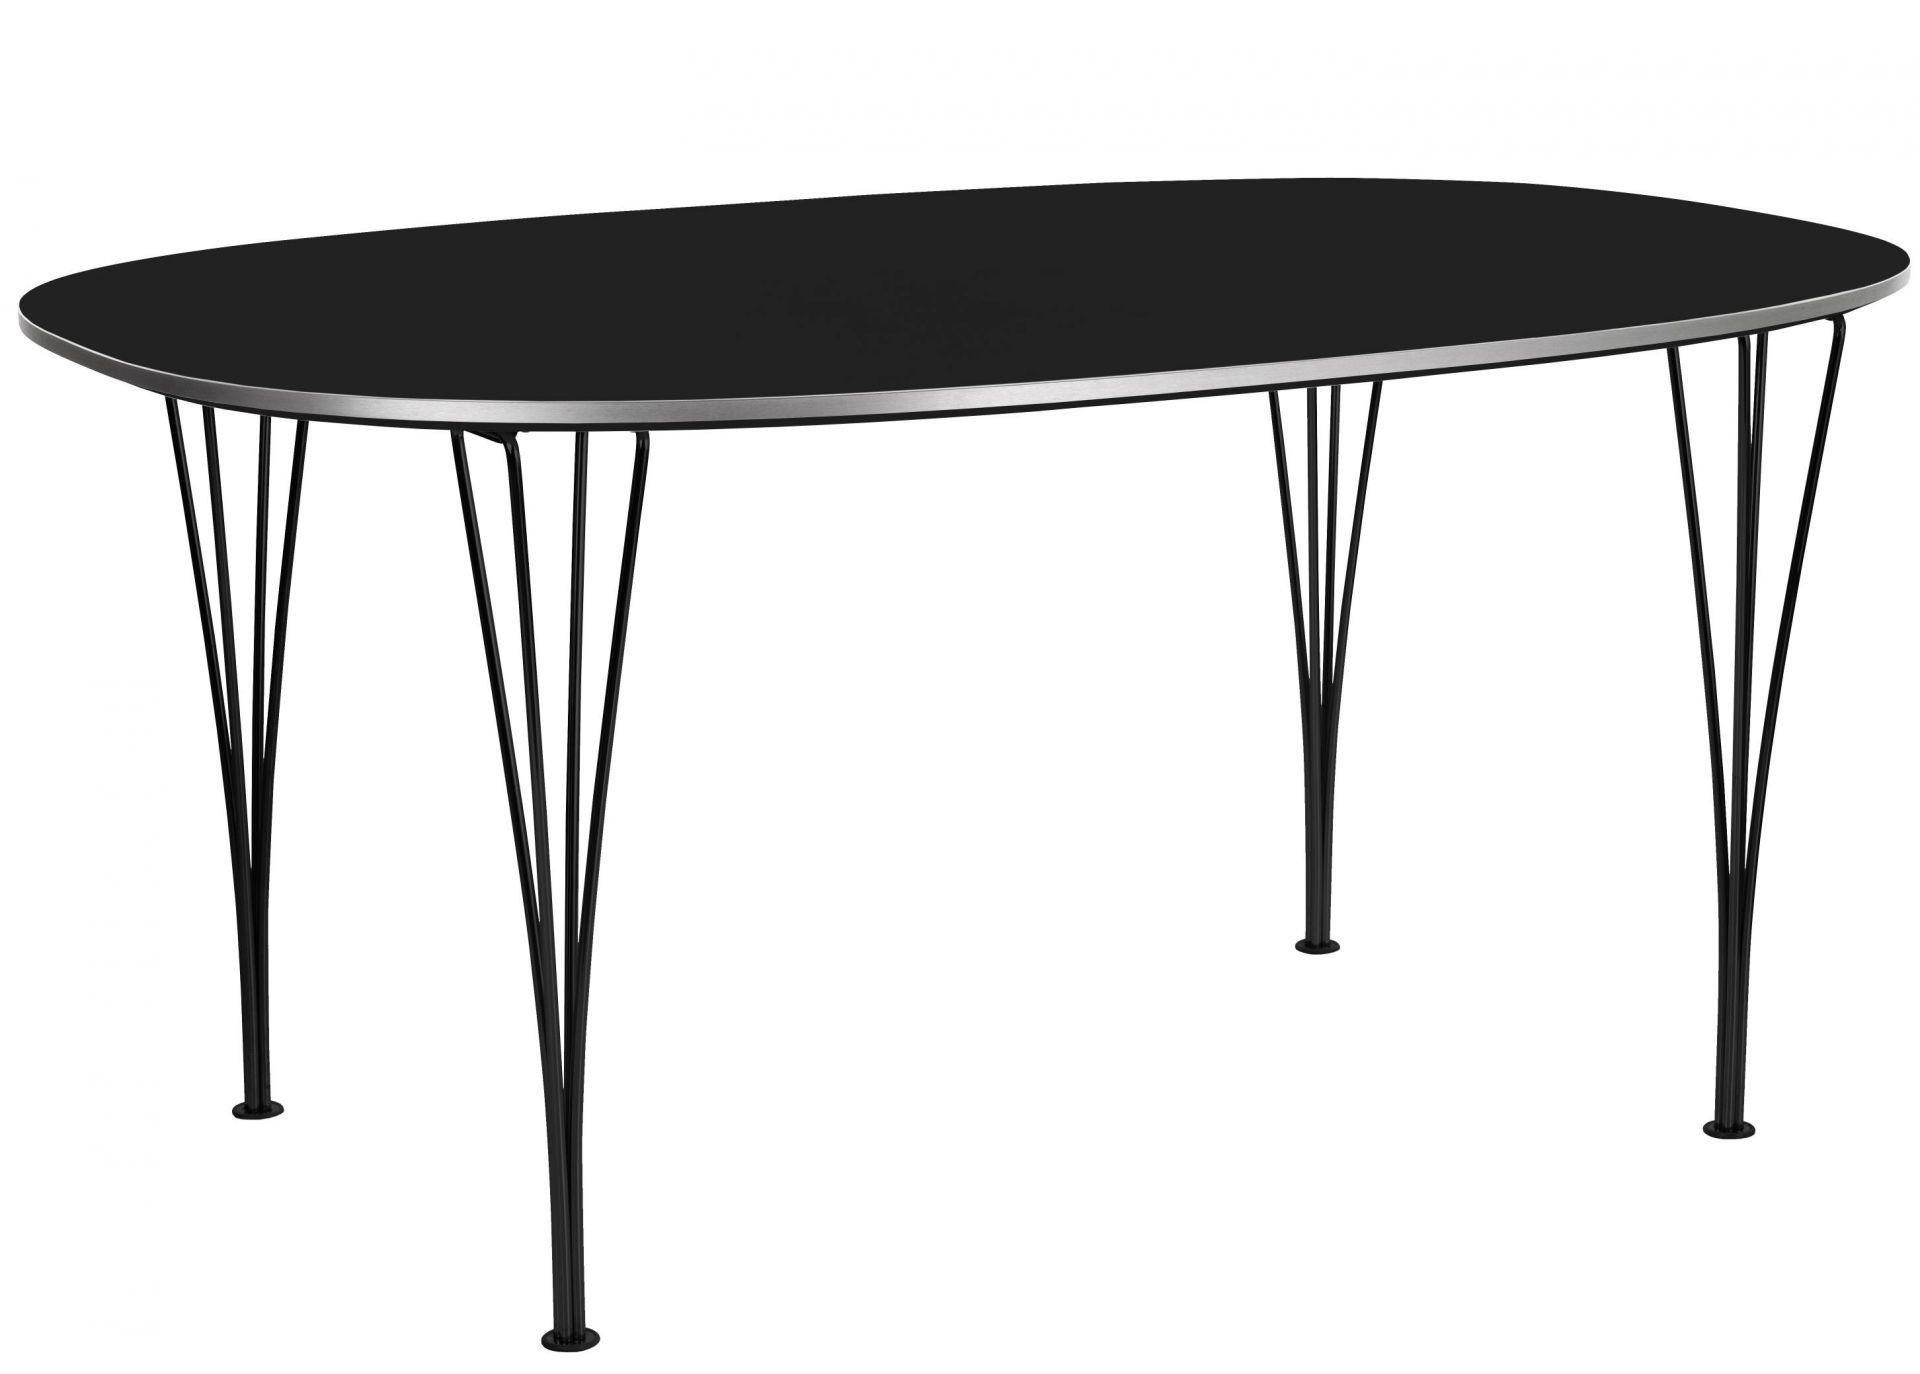 Table Series Super Elliptical Fritz Hansen